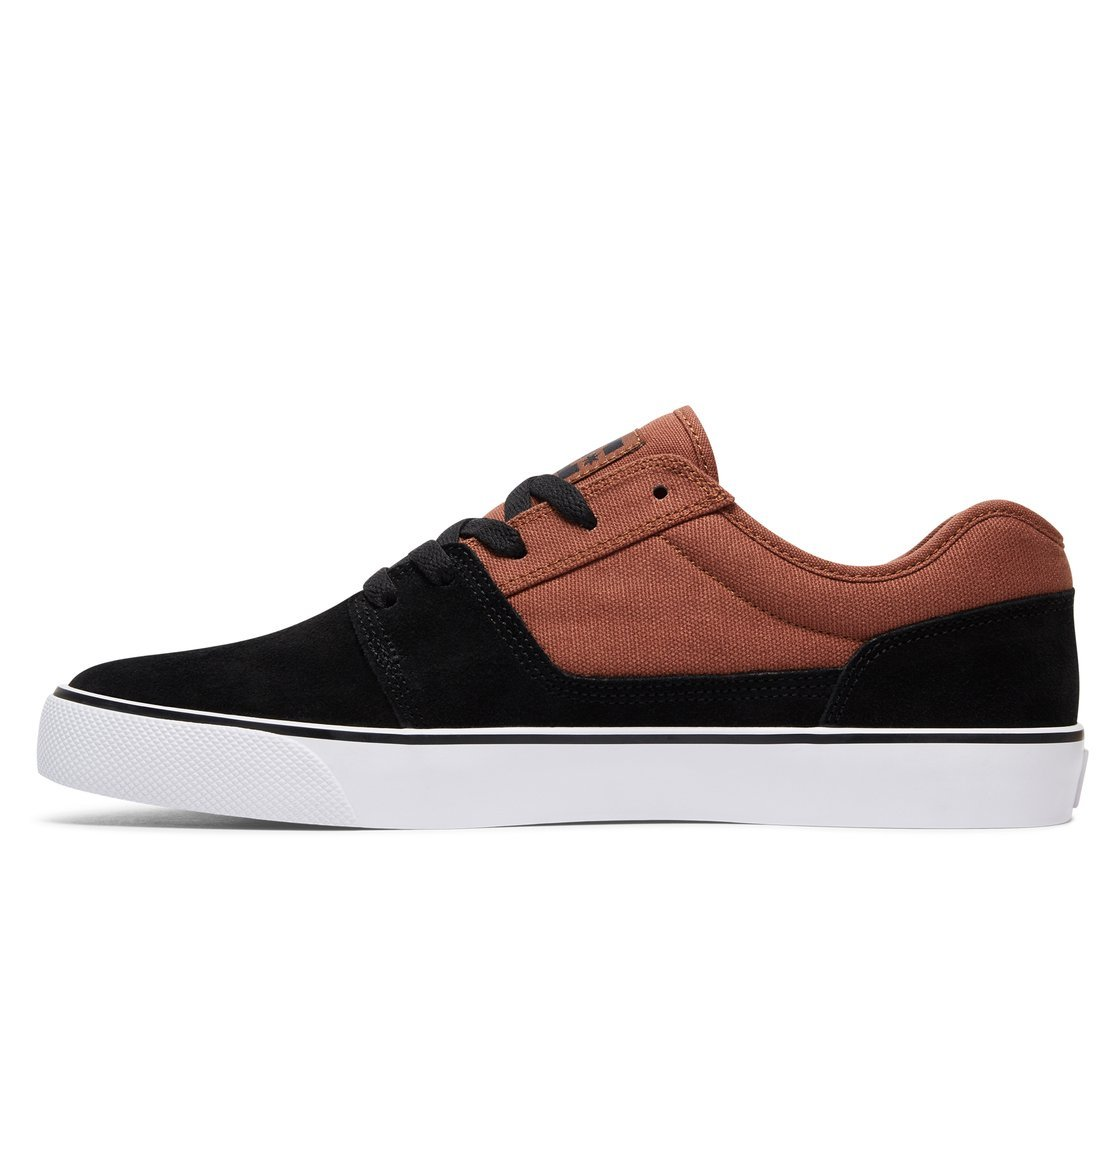 DC TONIK Unisex-Erwachsene Unisex-Erwachsene TONIK Sneakers schwarz/Camel b25cb2